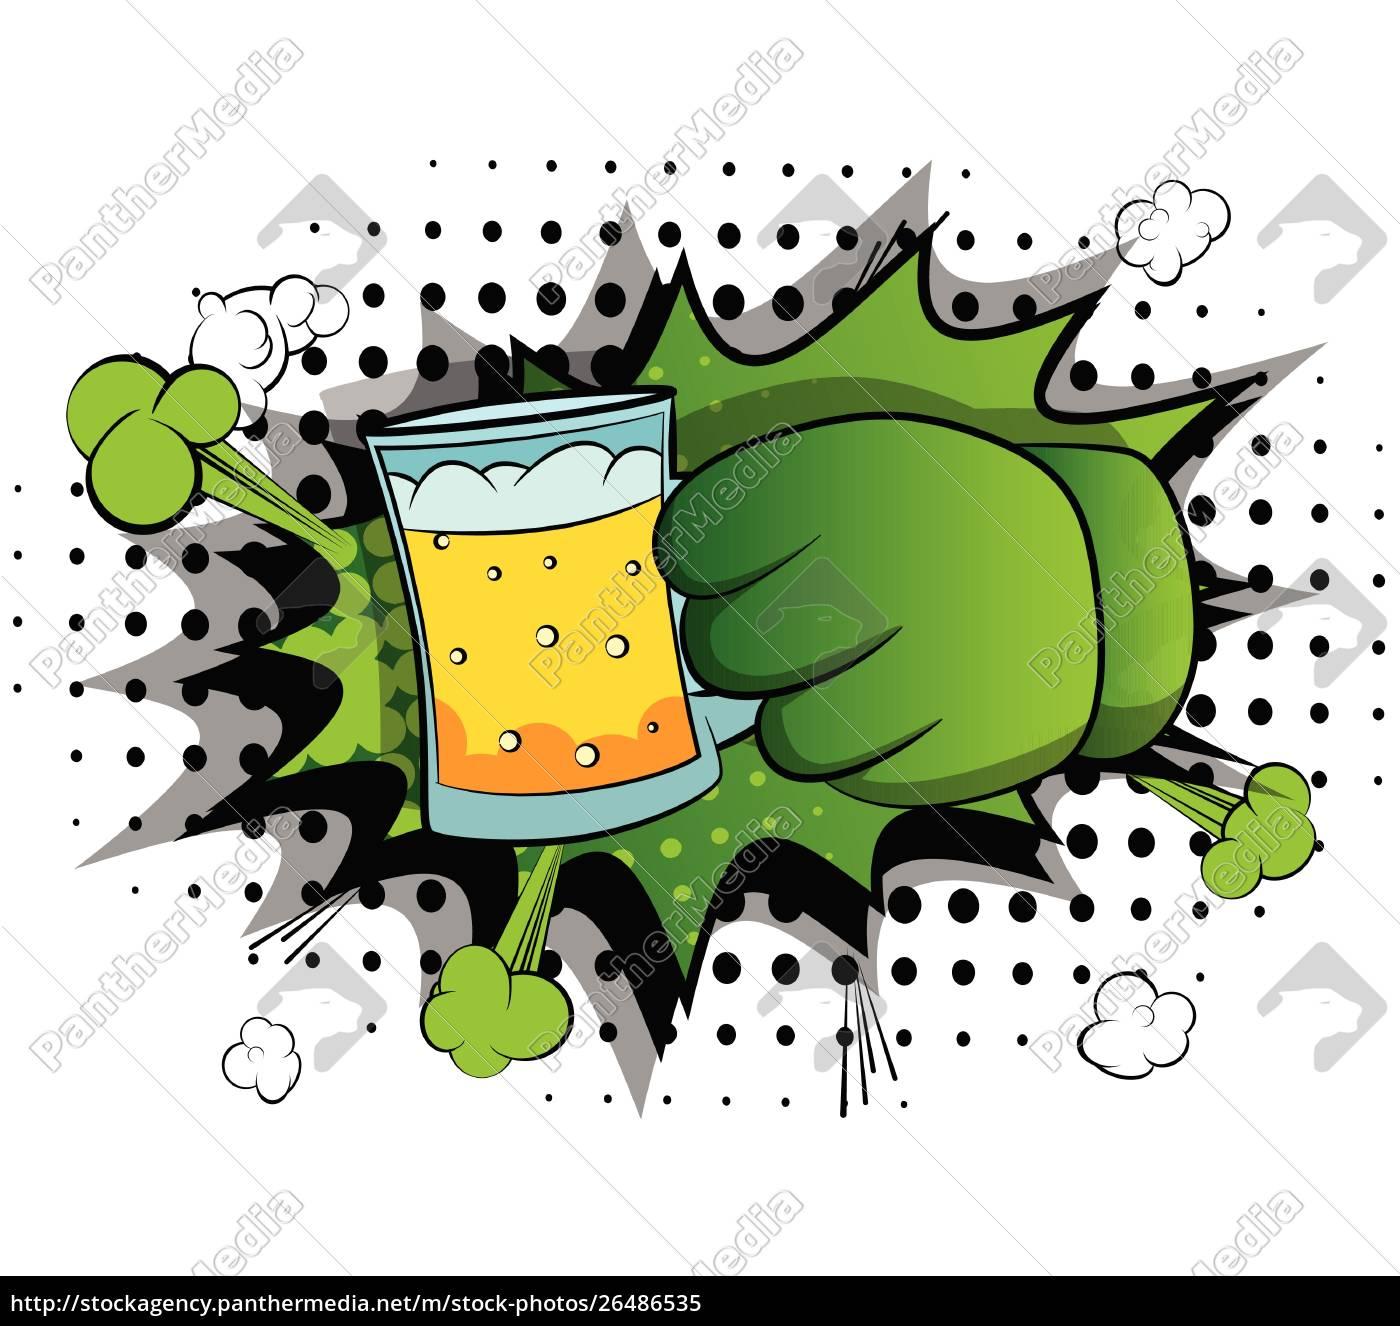 cartoon, hands, holding, a, beer. - 26486535